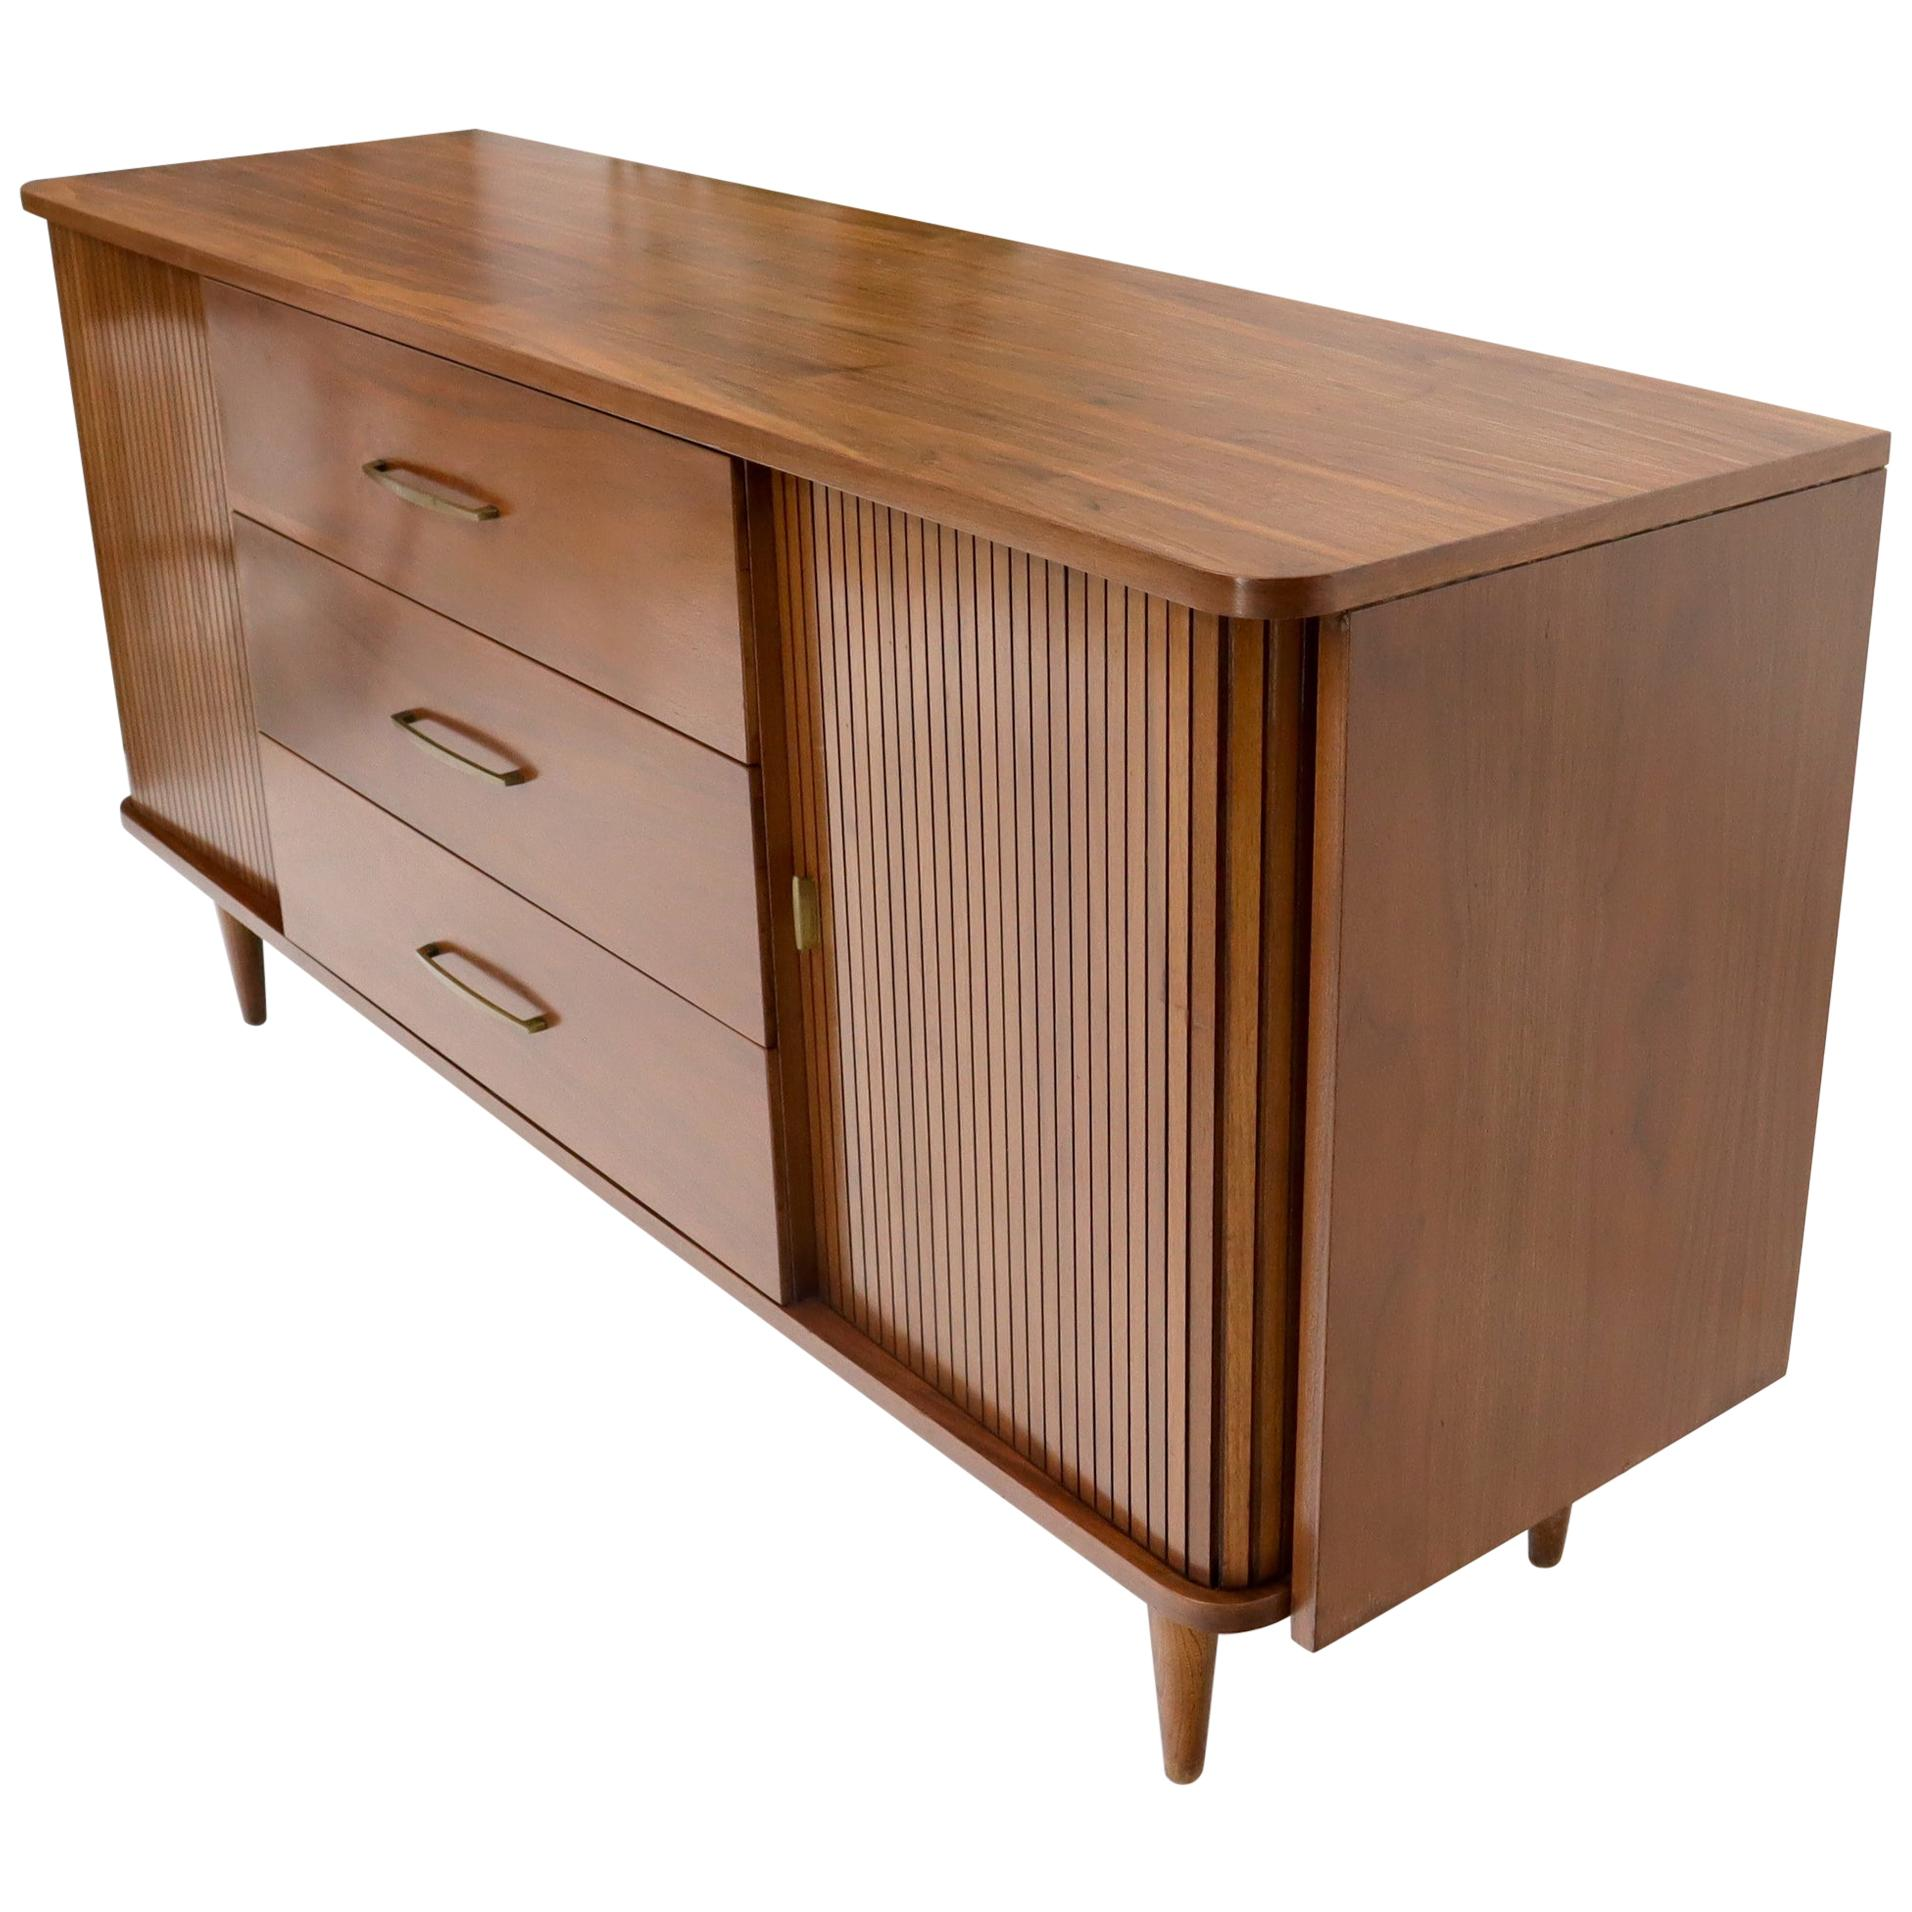 American Walnut Mid-Century Modern Tambour Doors Long Dresser Credenza